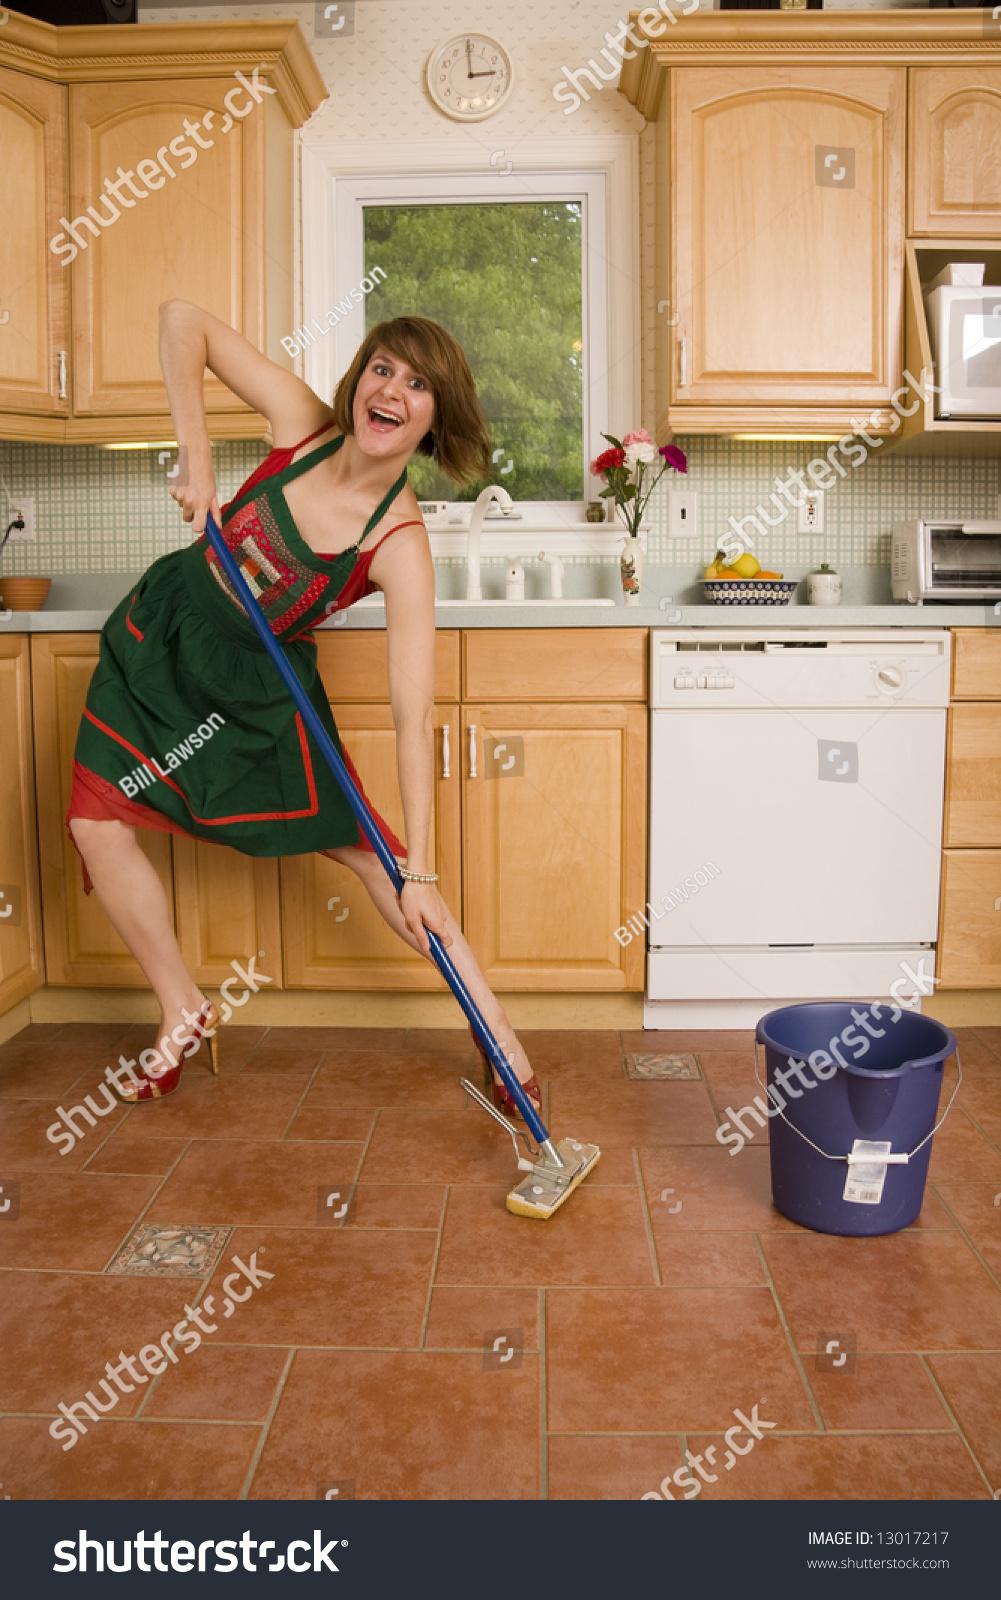 Mopping Kitchen Floor Happy Woman Mopping Floor Stock Photo 13017217 Shutterstock